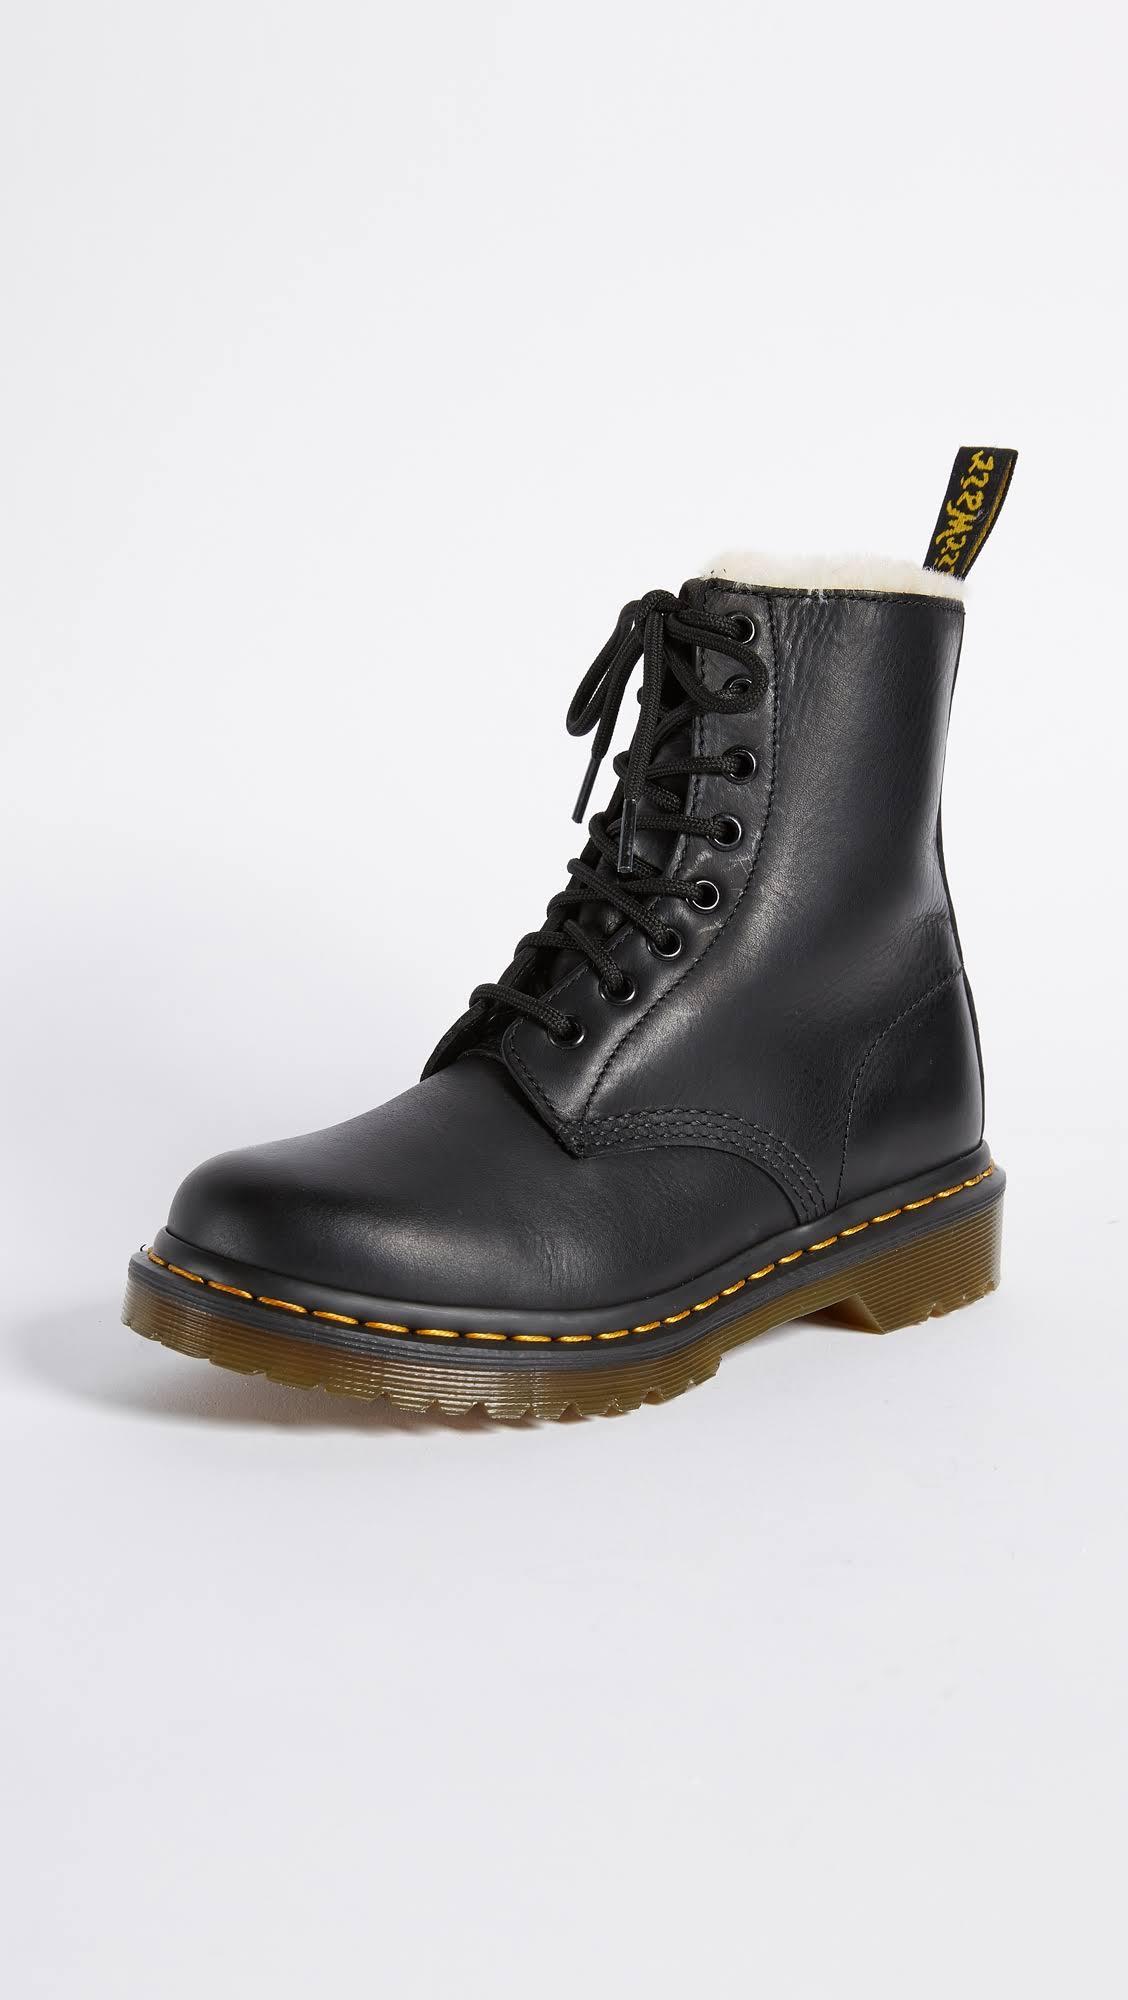 8 Eye Sherpa Boots DrMartens 1460 Nero Serena htsrdxoQCB